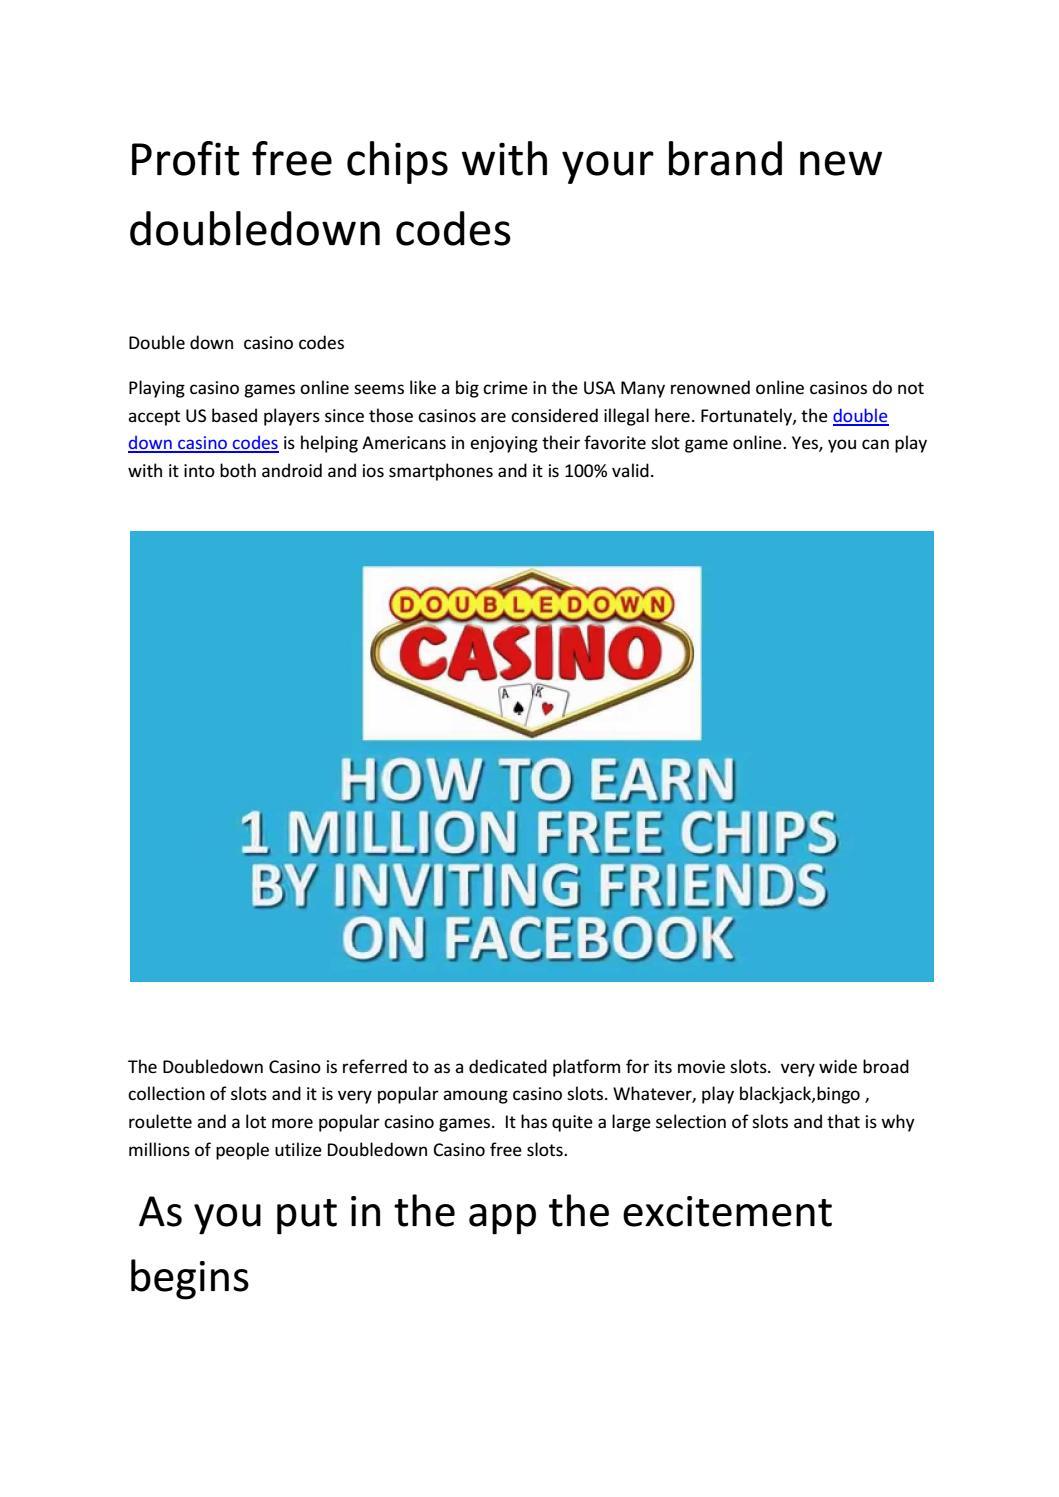 Doubledown Promo Codes